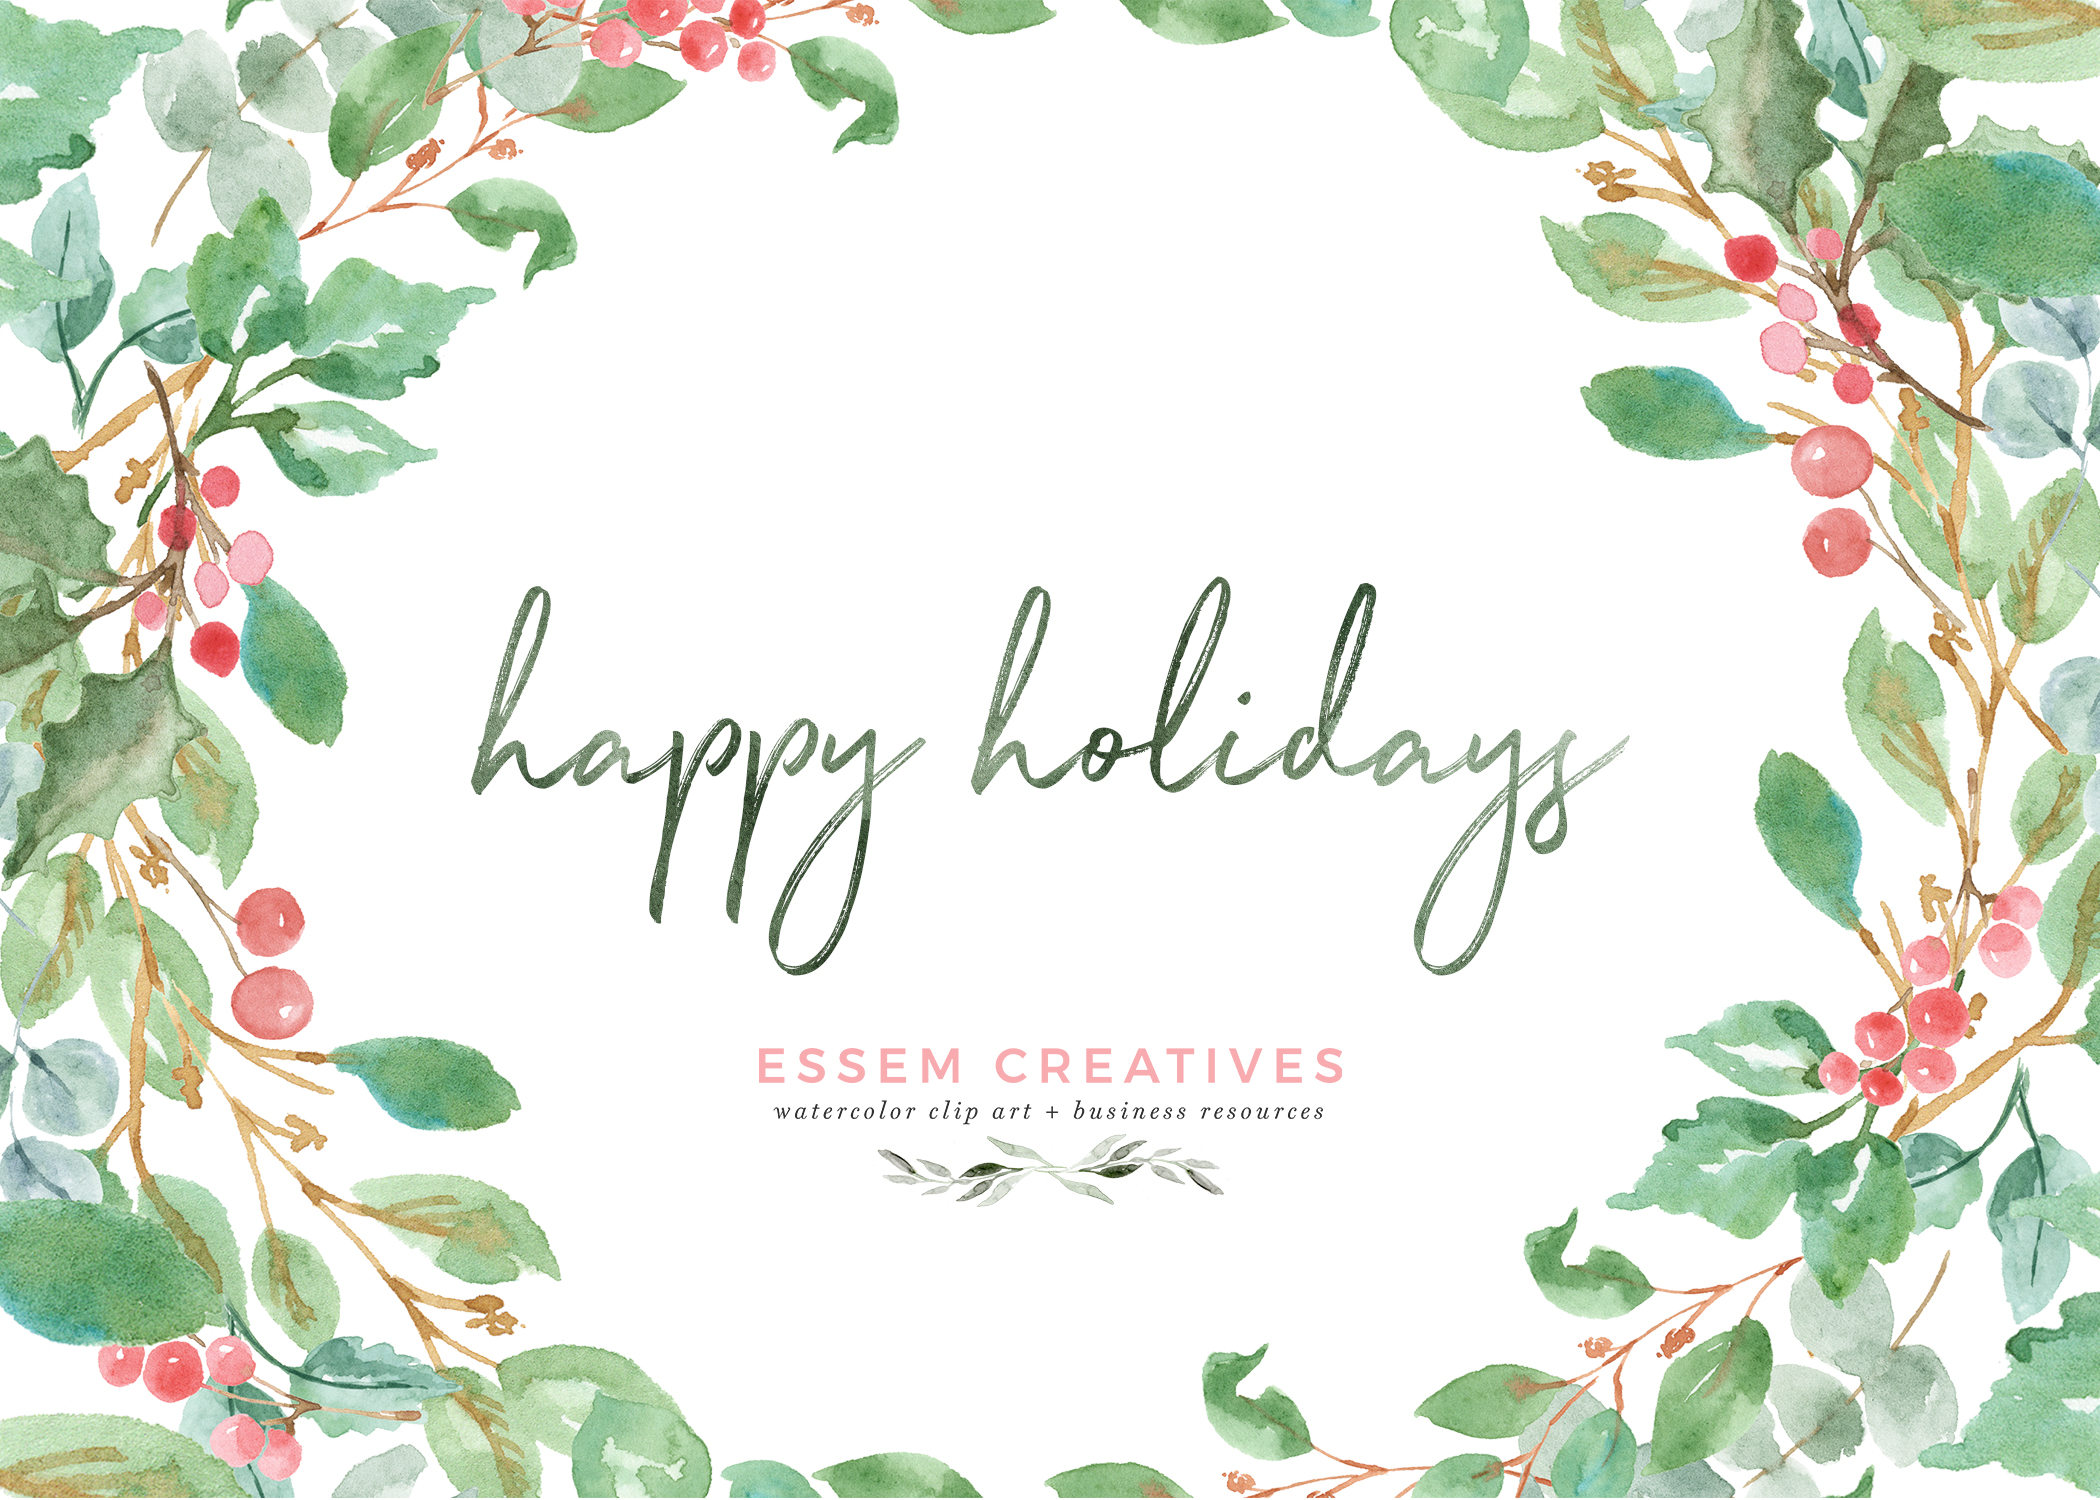 Christmas card borders clipart clip stock Watercolor Christmas Photo Card Templates | Essem Creatives clip stock